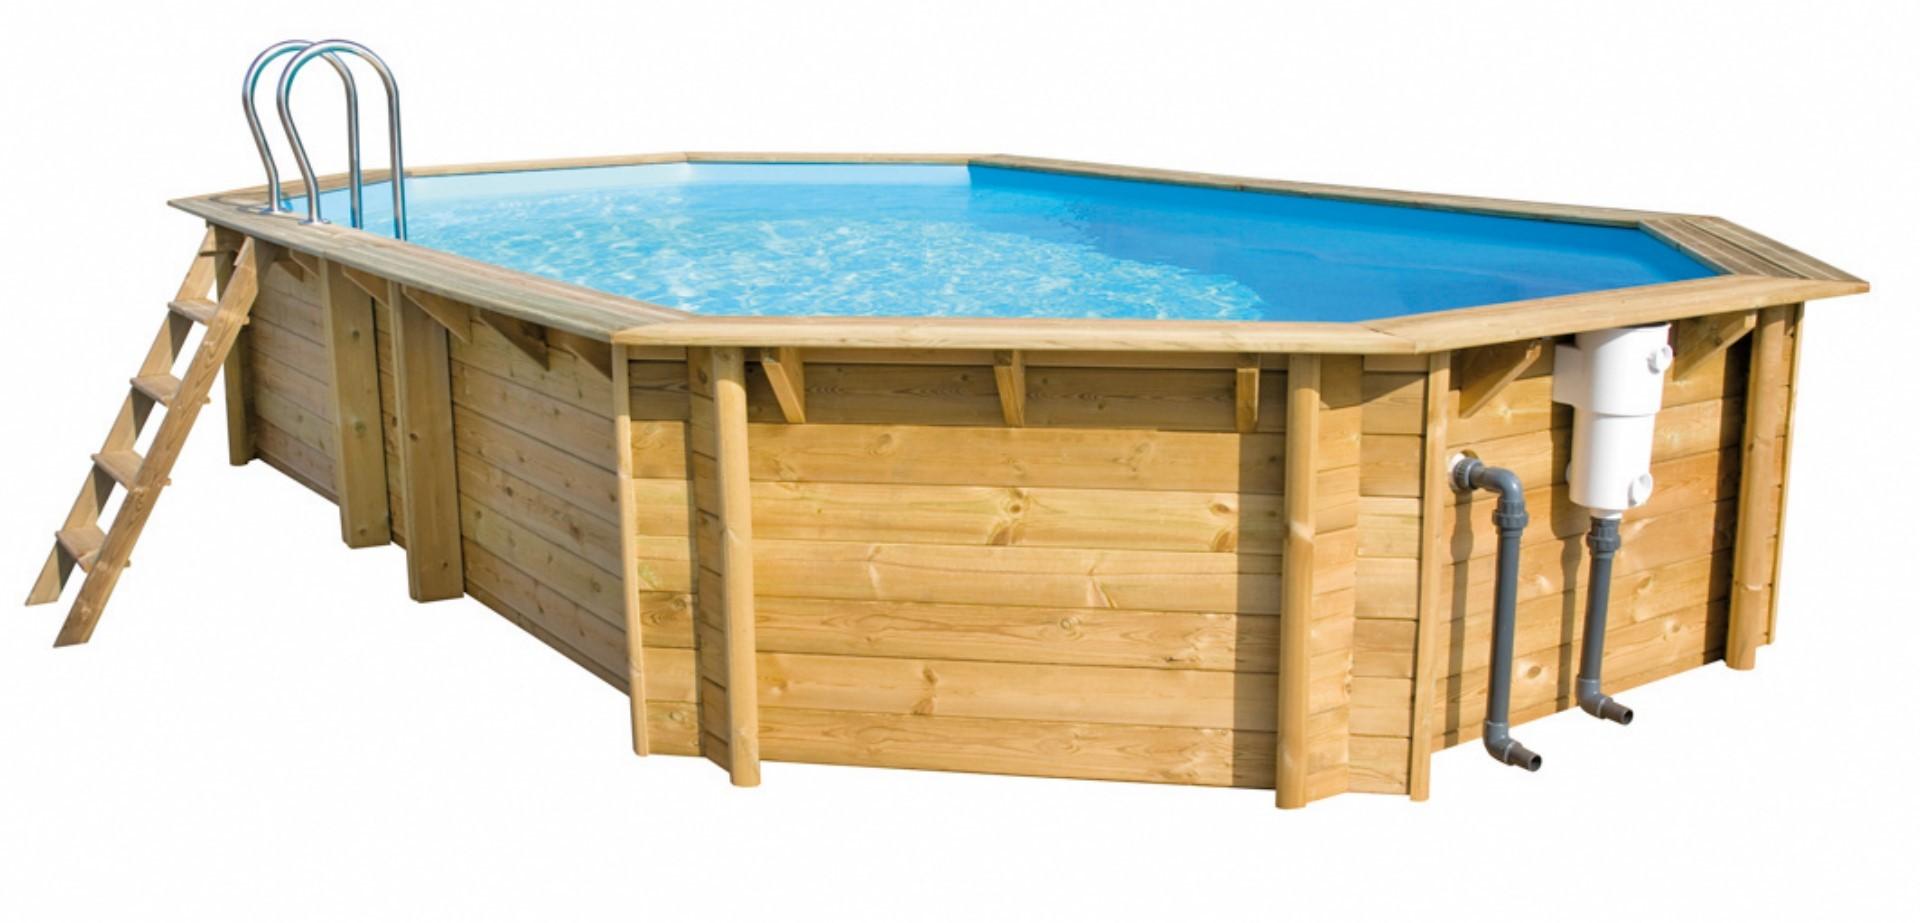 Piscine bois octogonale 3m for Prix piscine octogonale bois